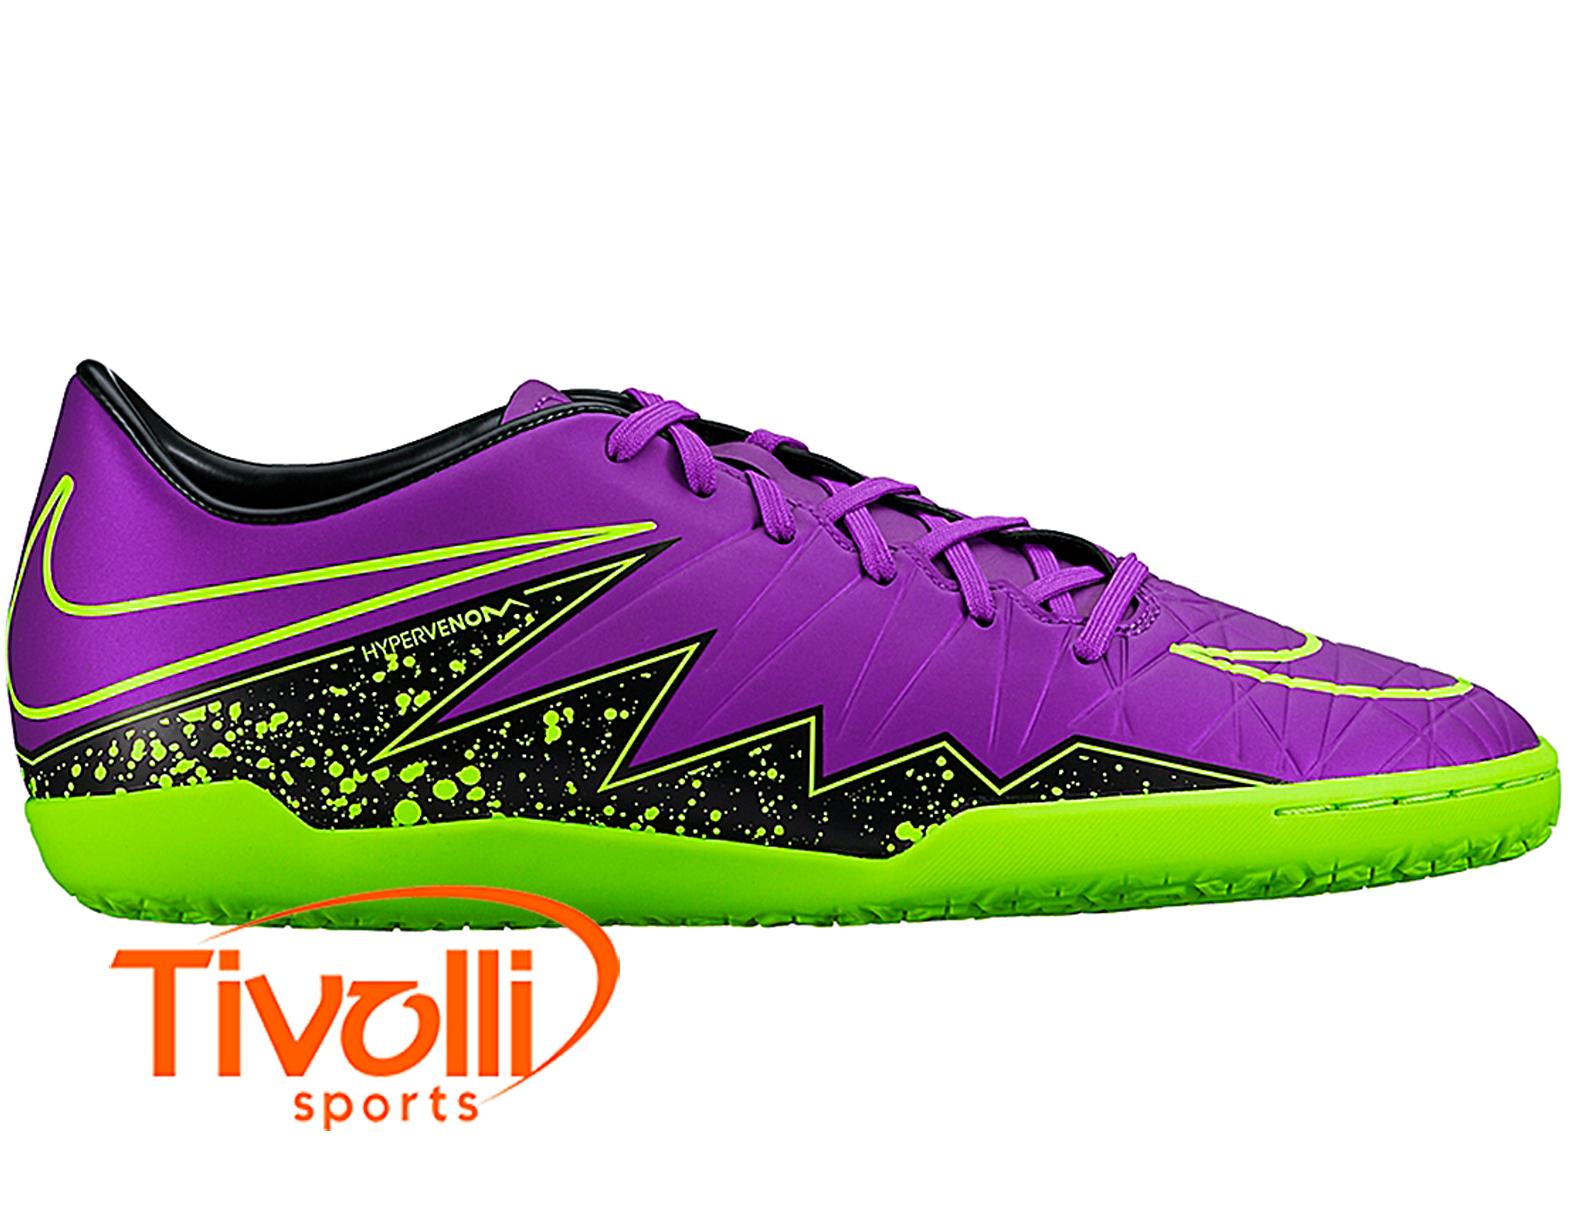 Chuteira Nike JR Hypervenom Phelon II IC Futsal Infantil - Mega Saldão 06b48ad6a98e8